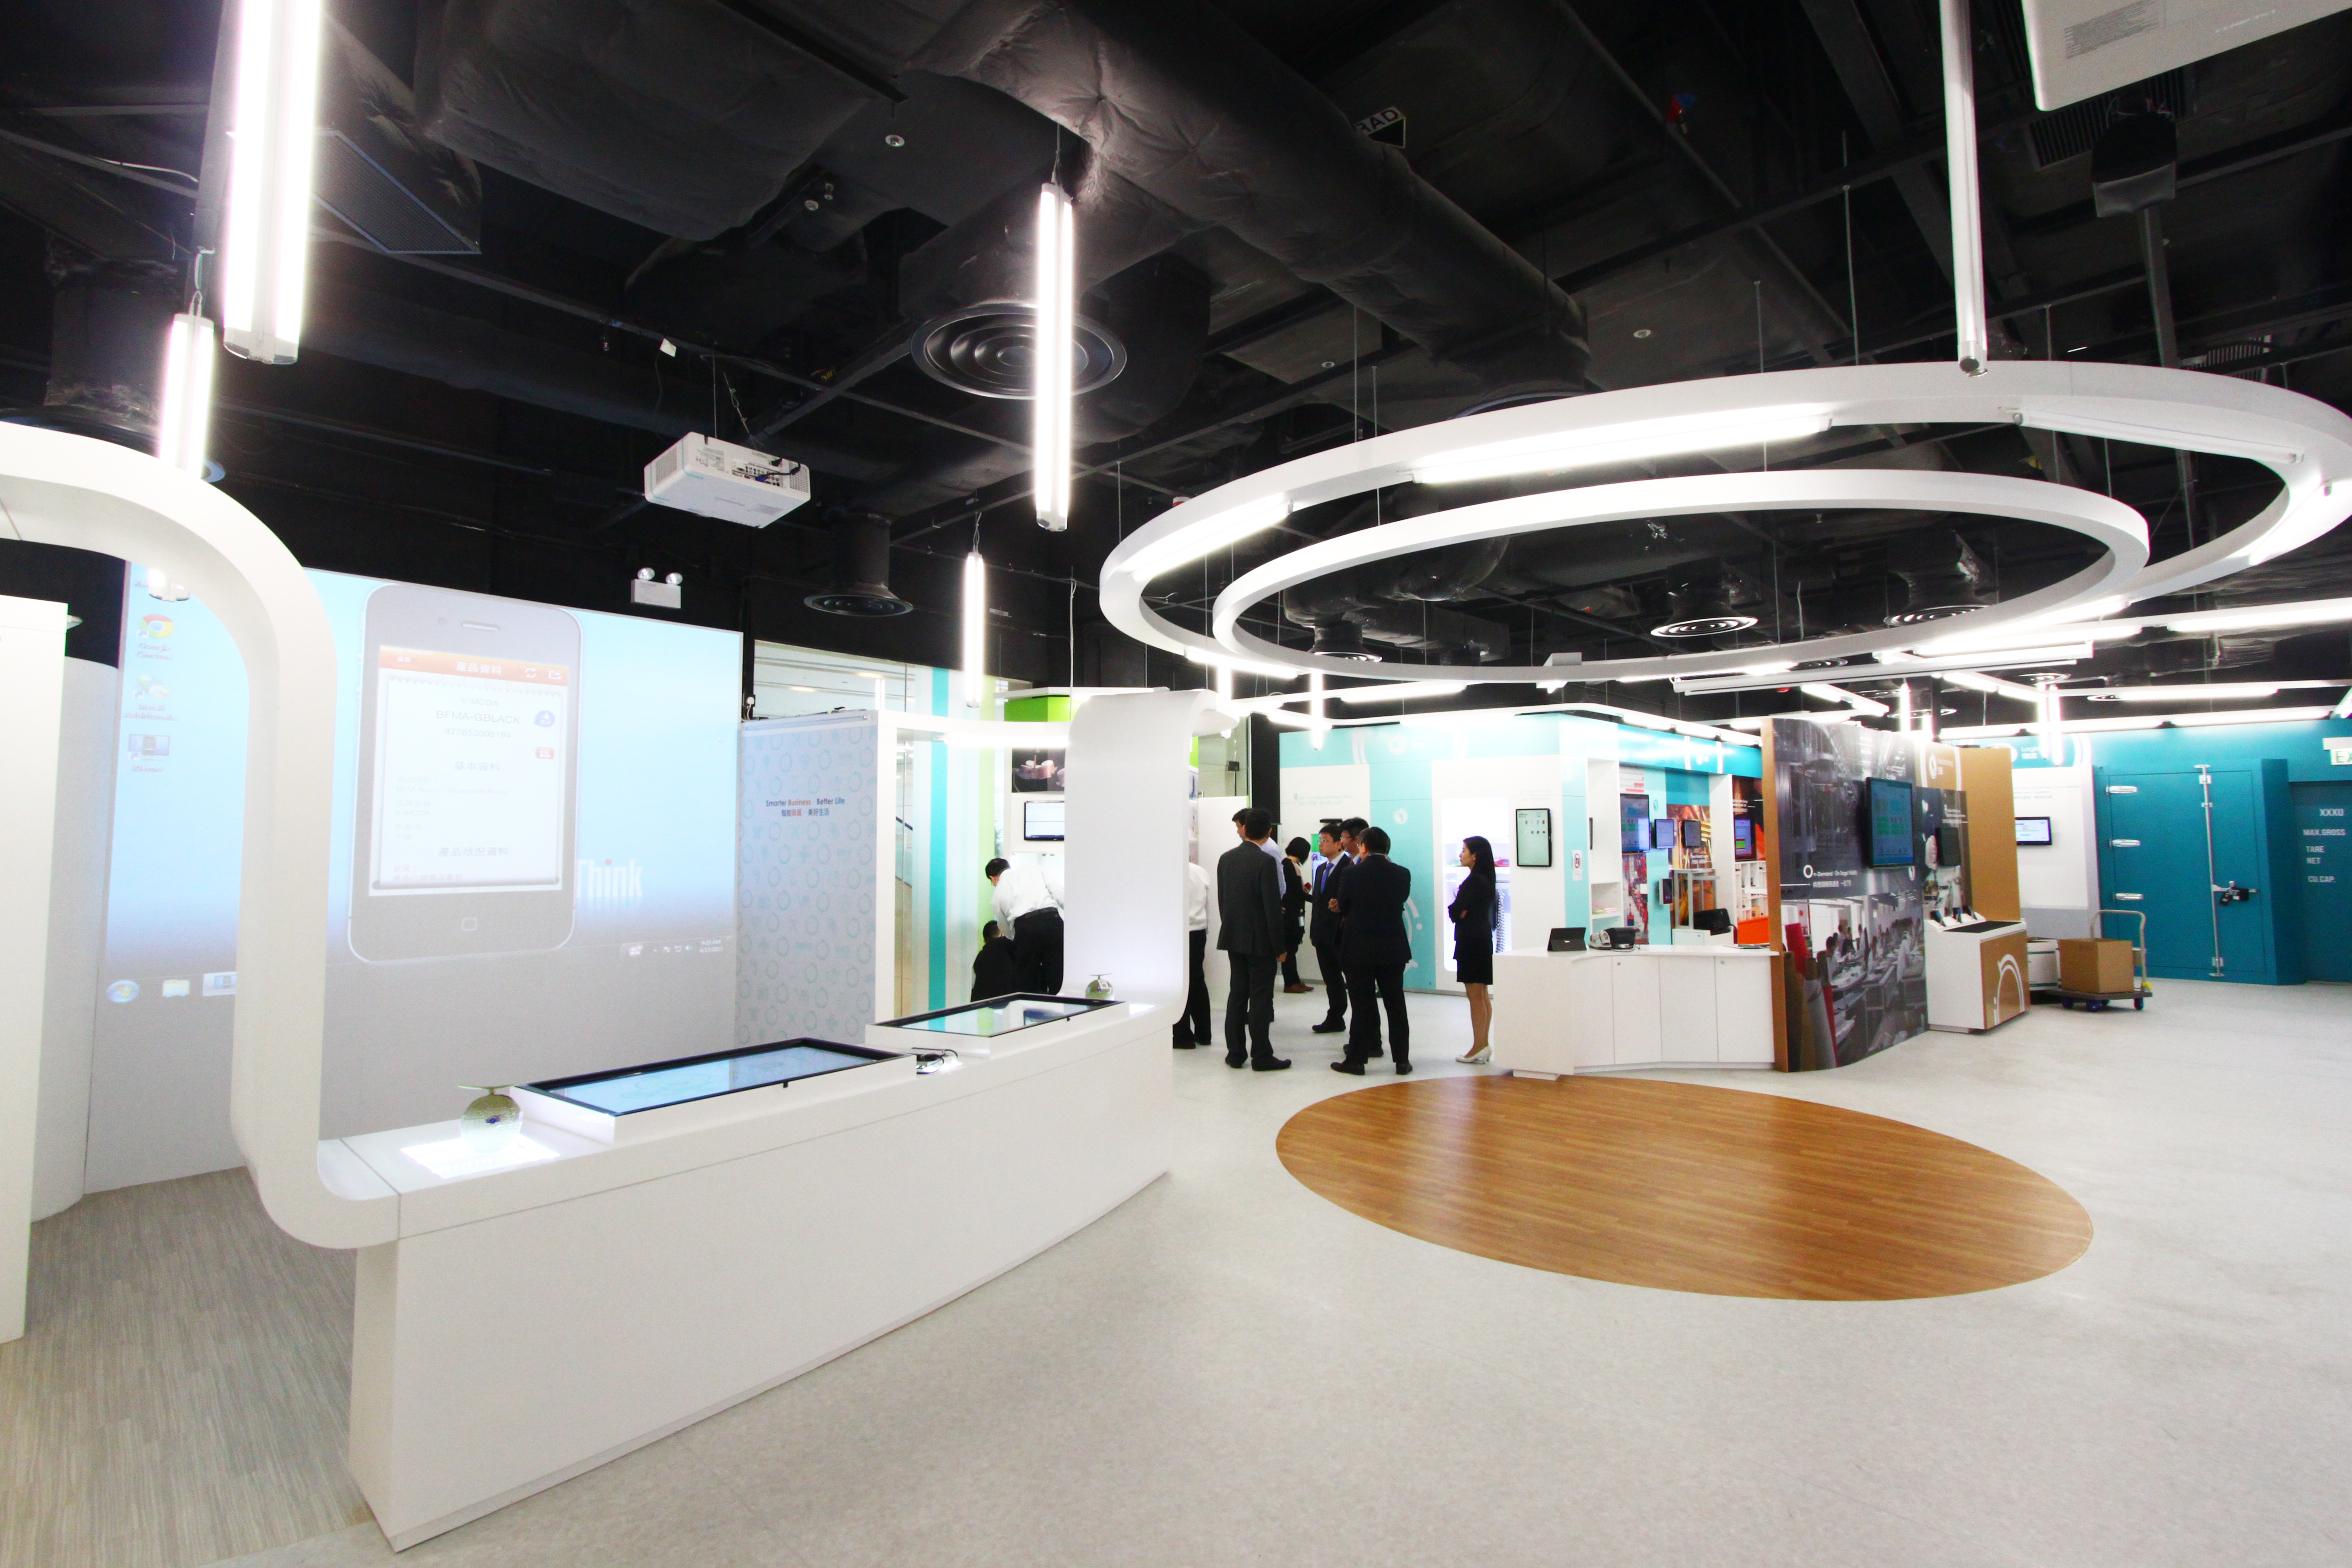 Science Park/ IoT Centre/ Reception